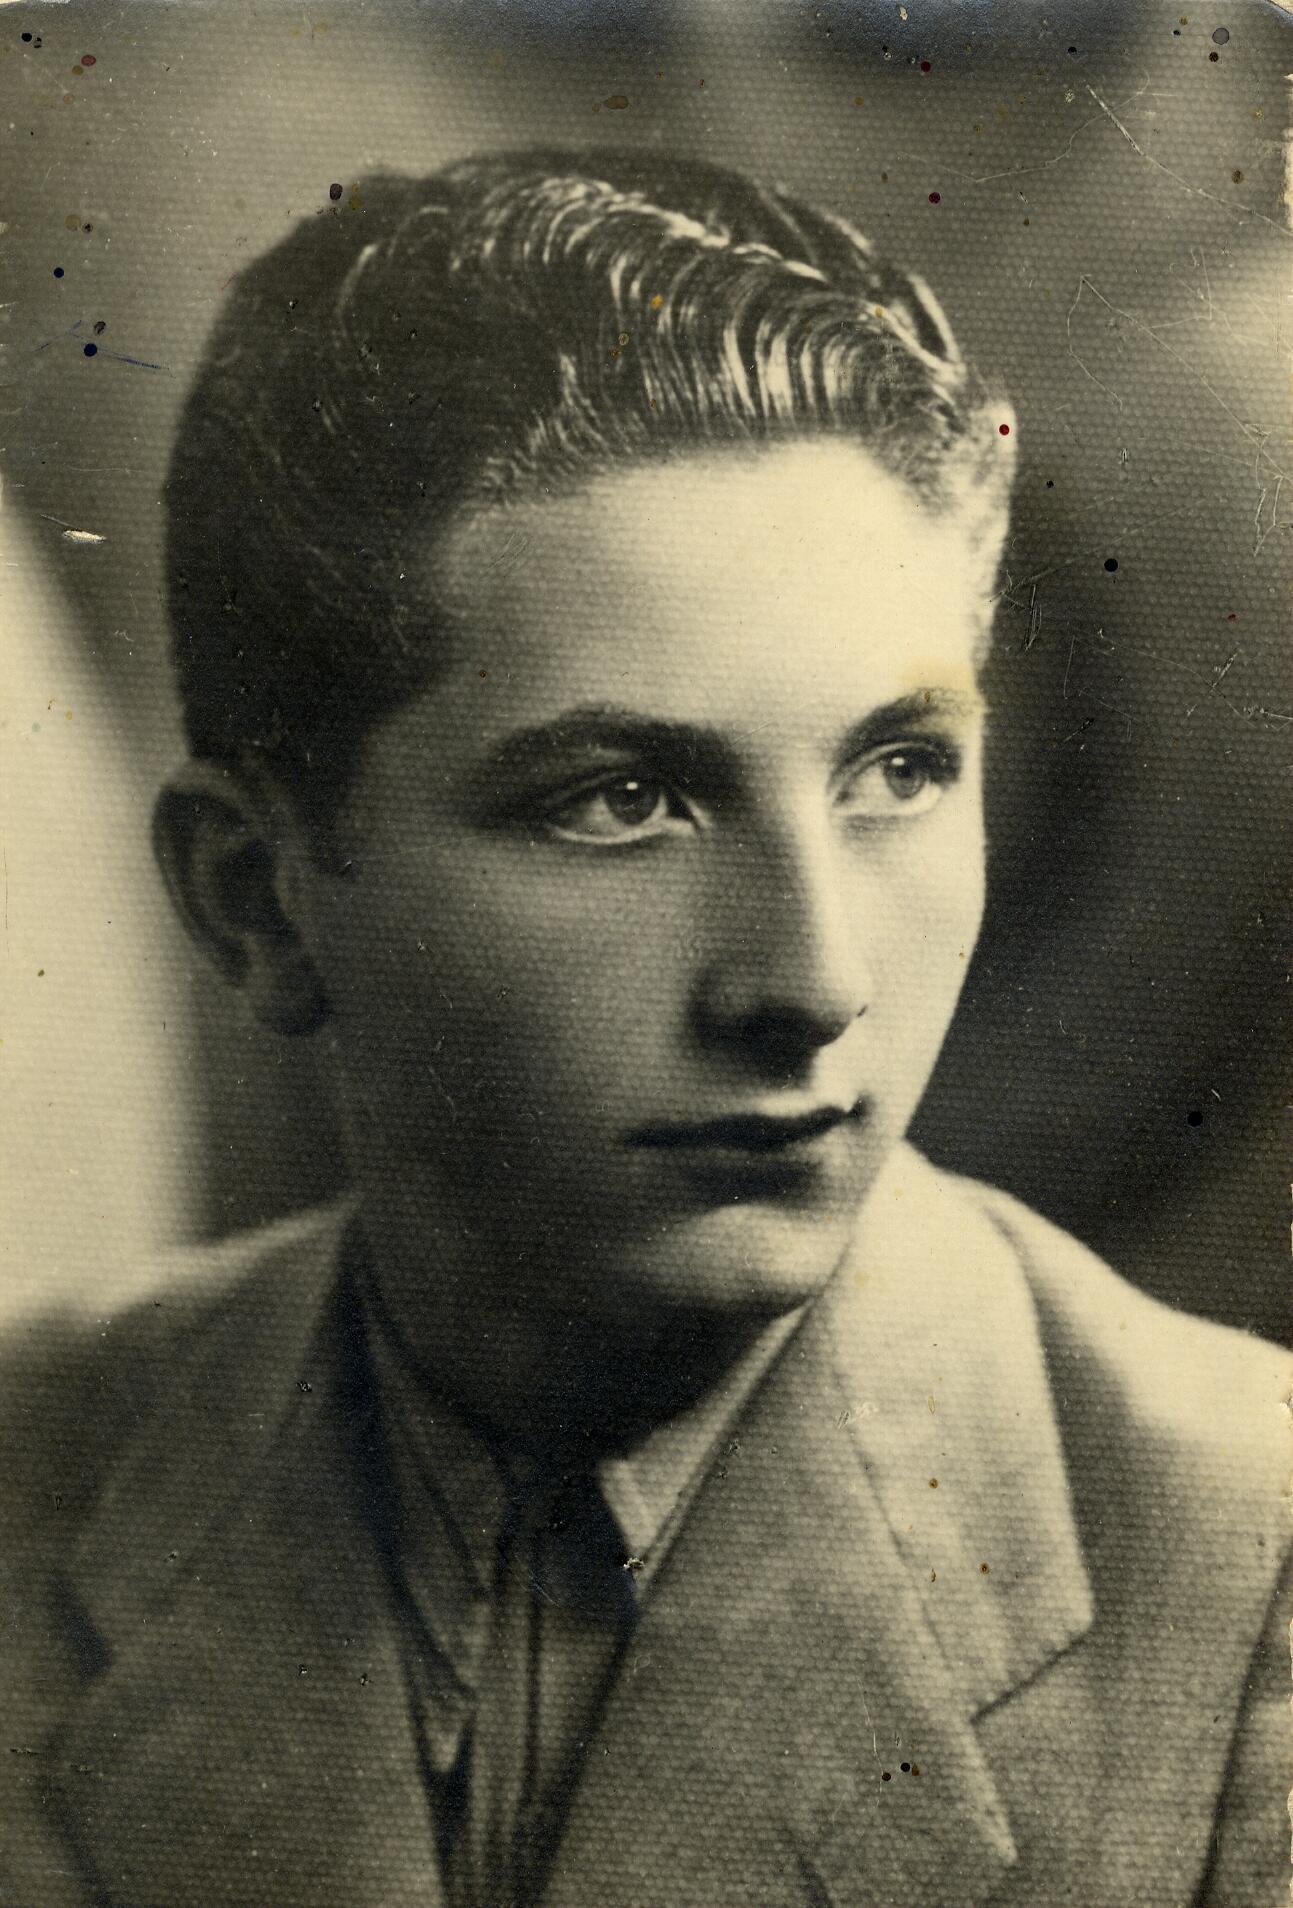 Ettore Boschi